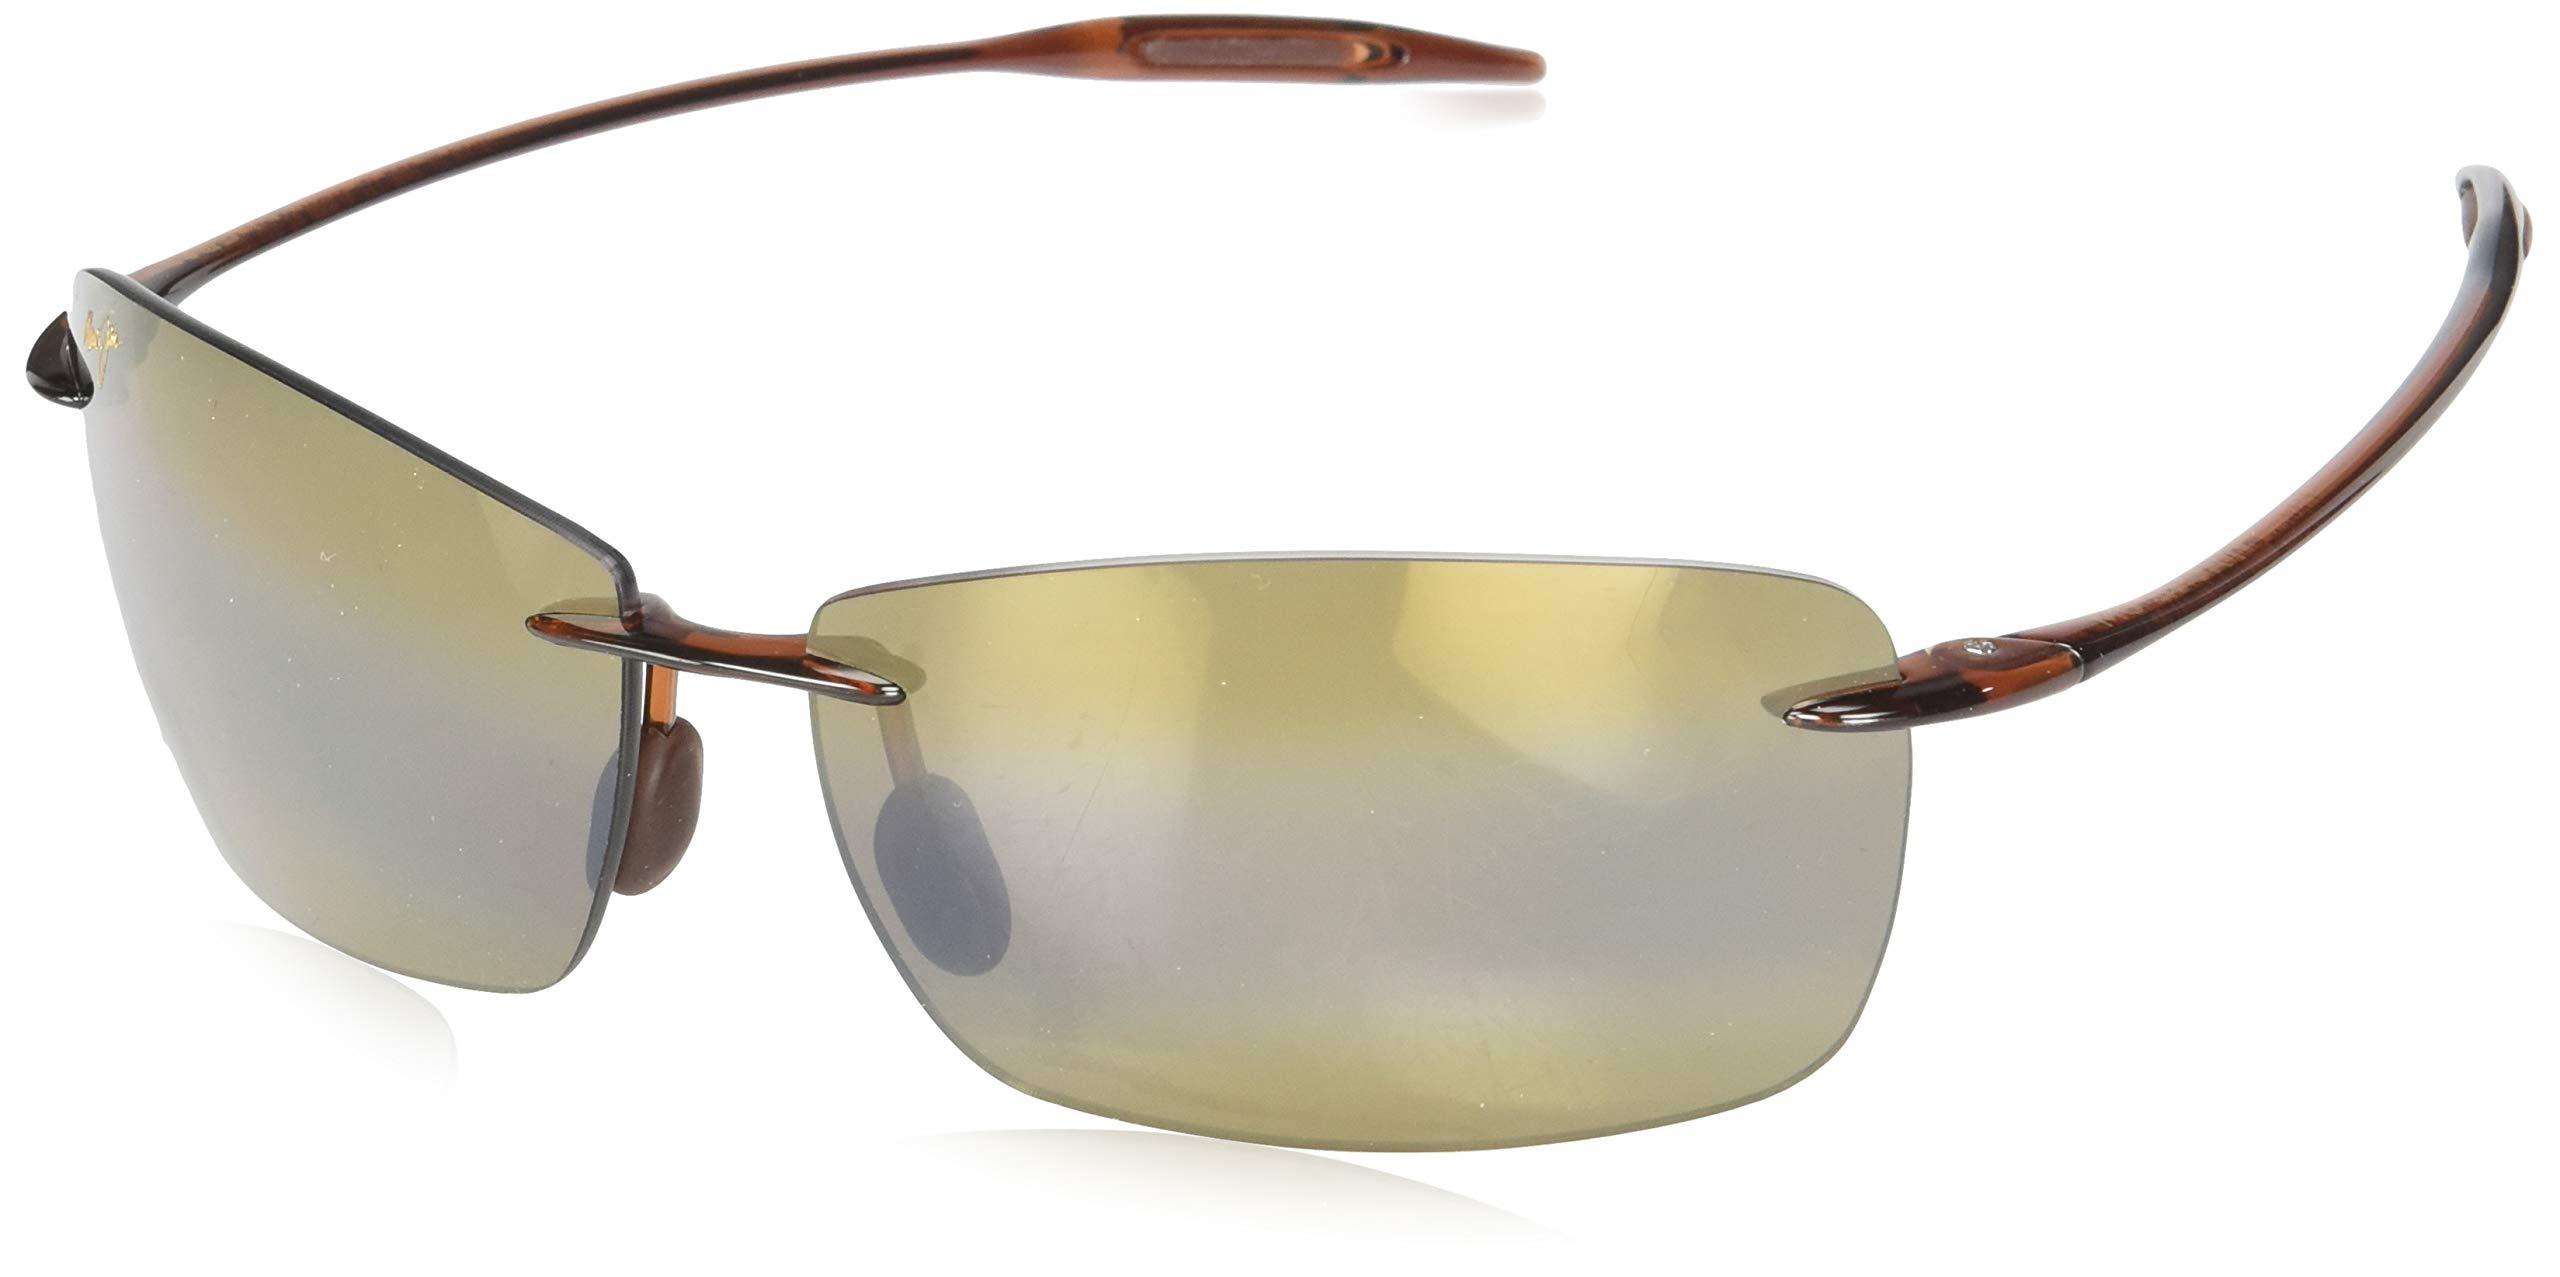 Maui Jim Lighthouse H423-26 Polarized Rimless Sunglasses, Rootbeer, 65 mm by Maui Jim